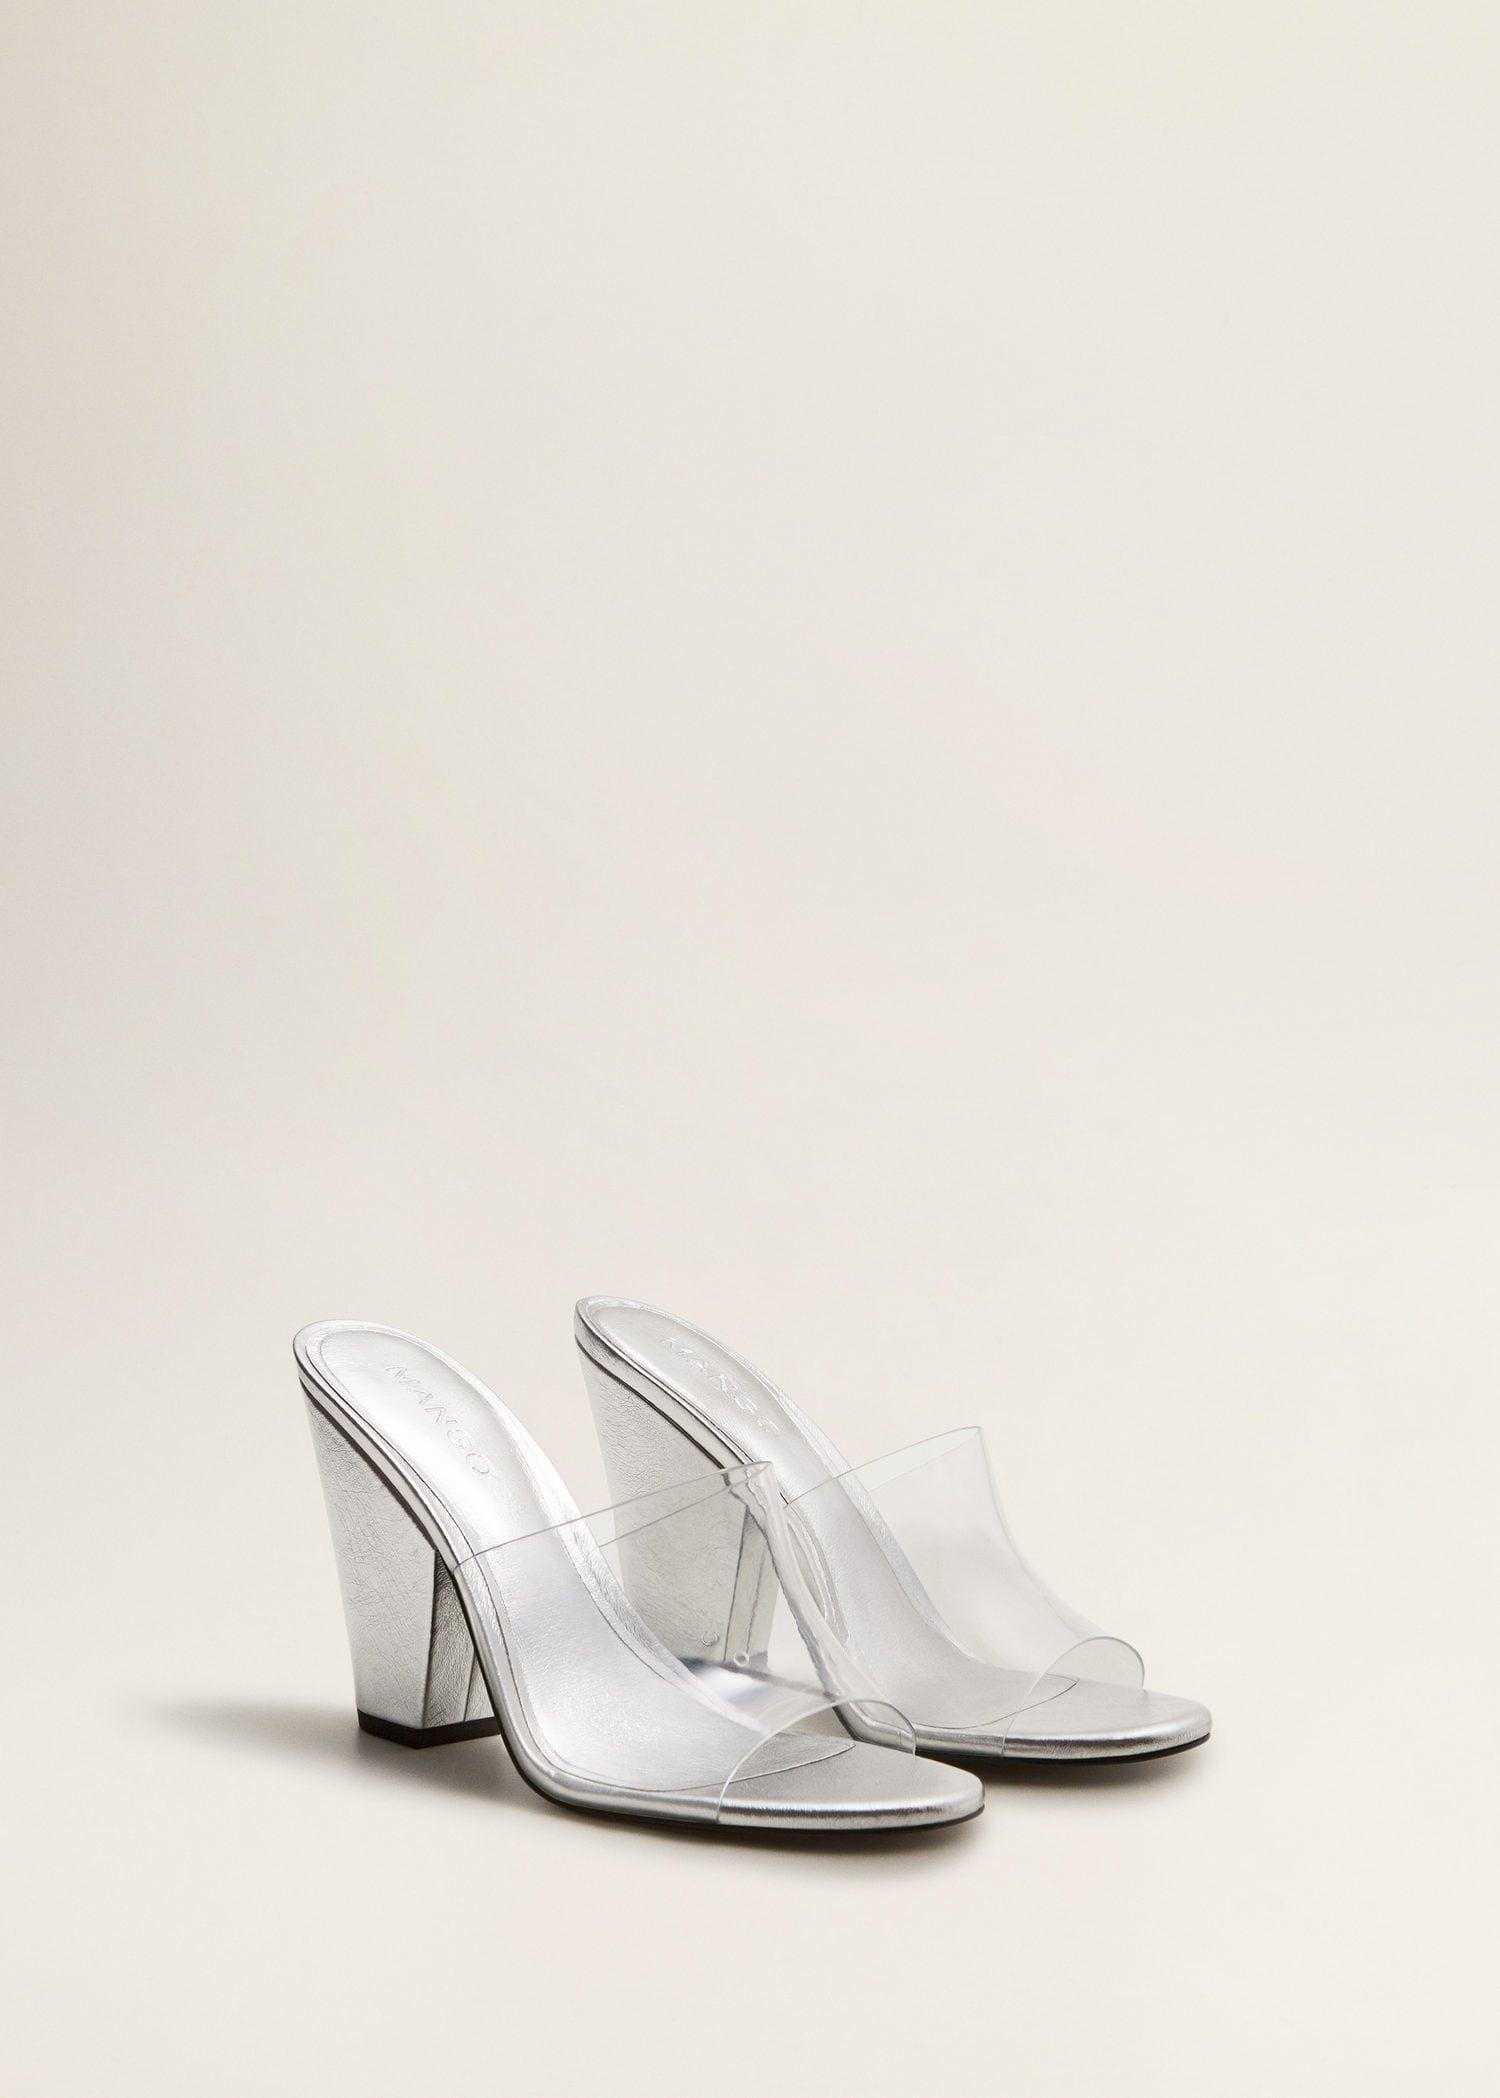 d6b6af502 Vinyl straps mules Mango, Ballerina Shoes, Footwear, Sandals, Heels, Boots,